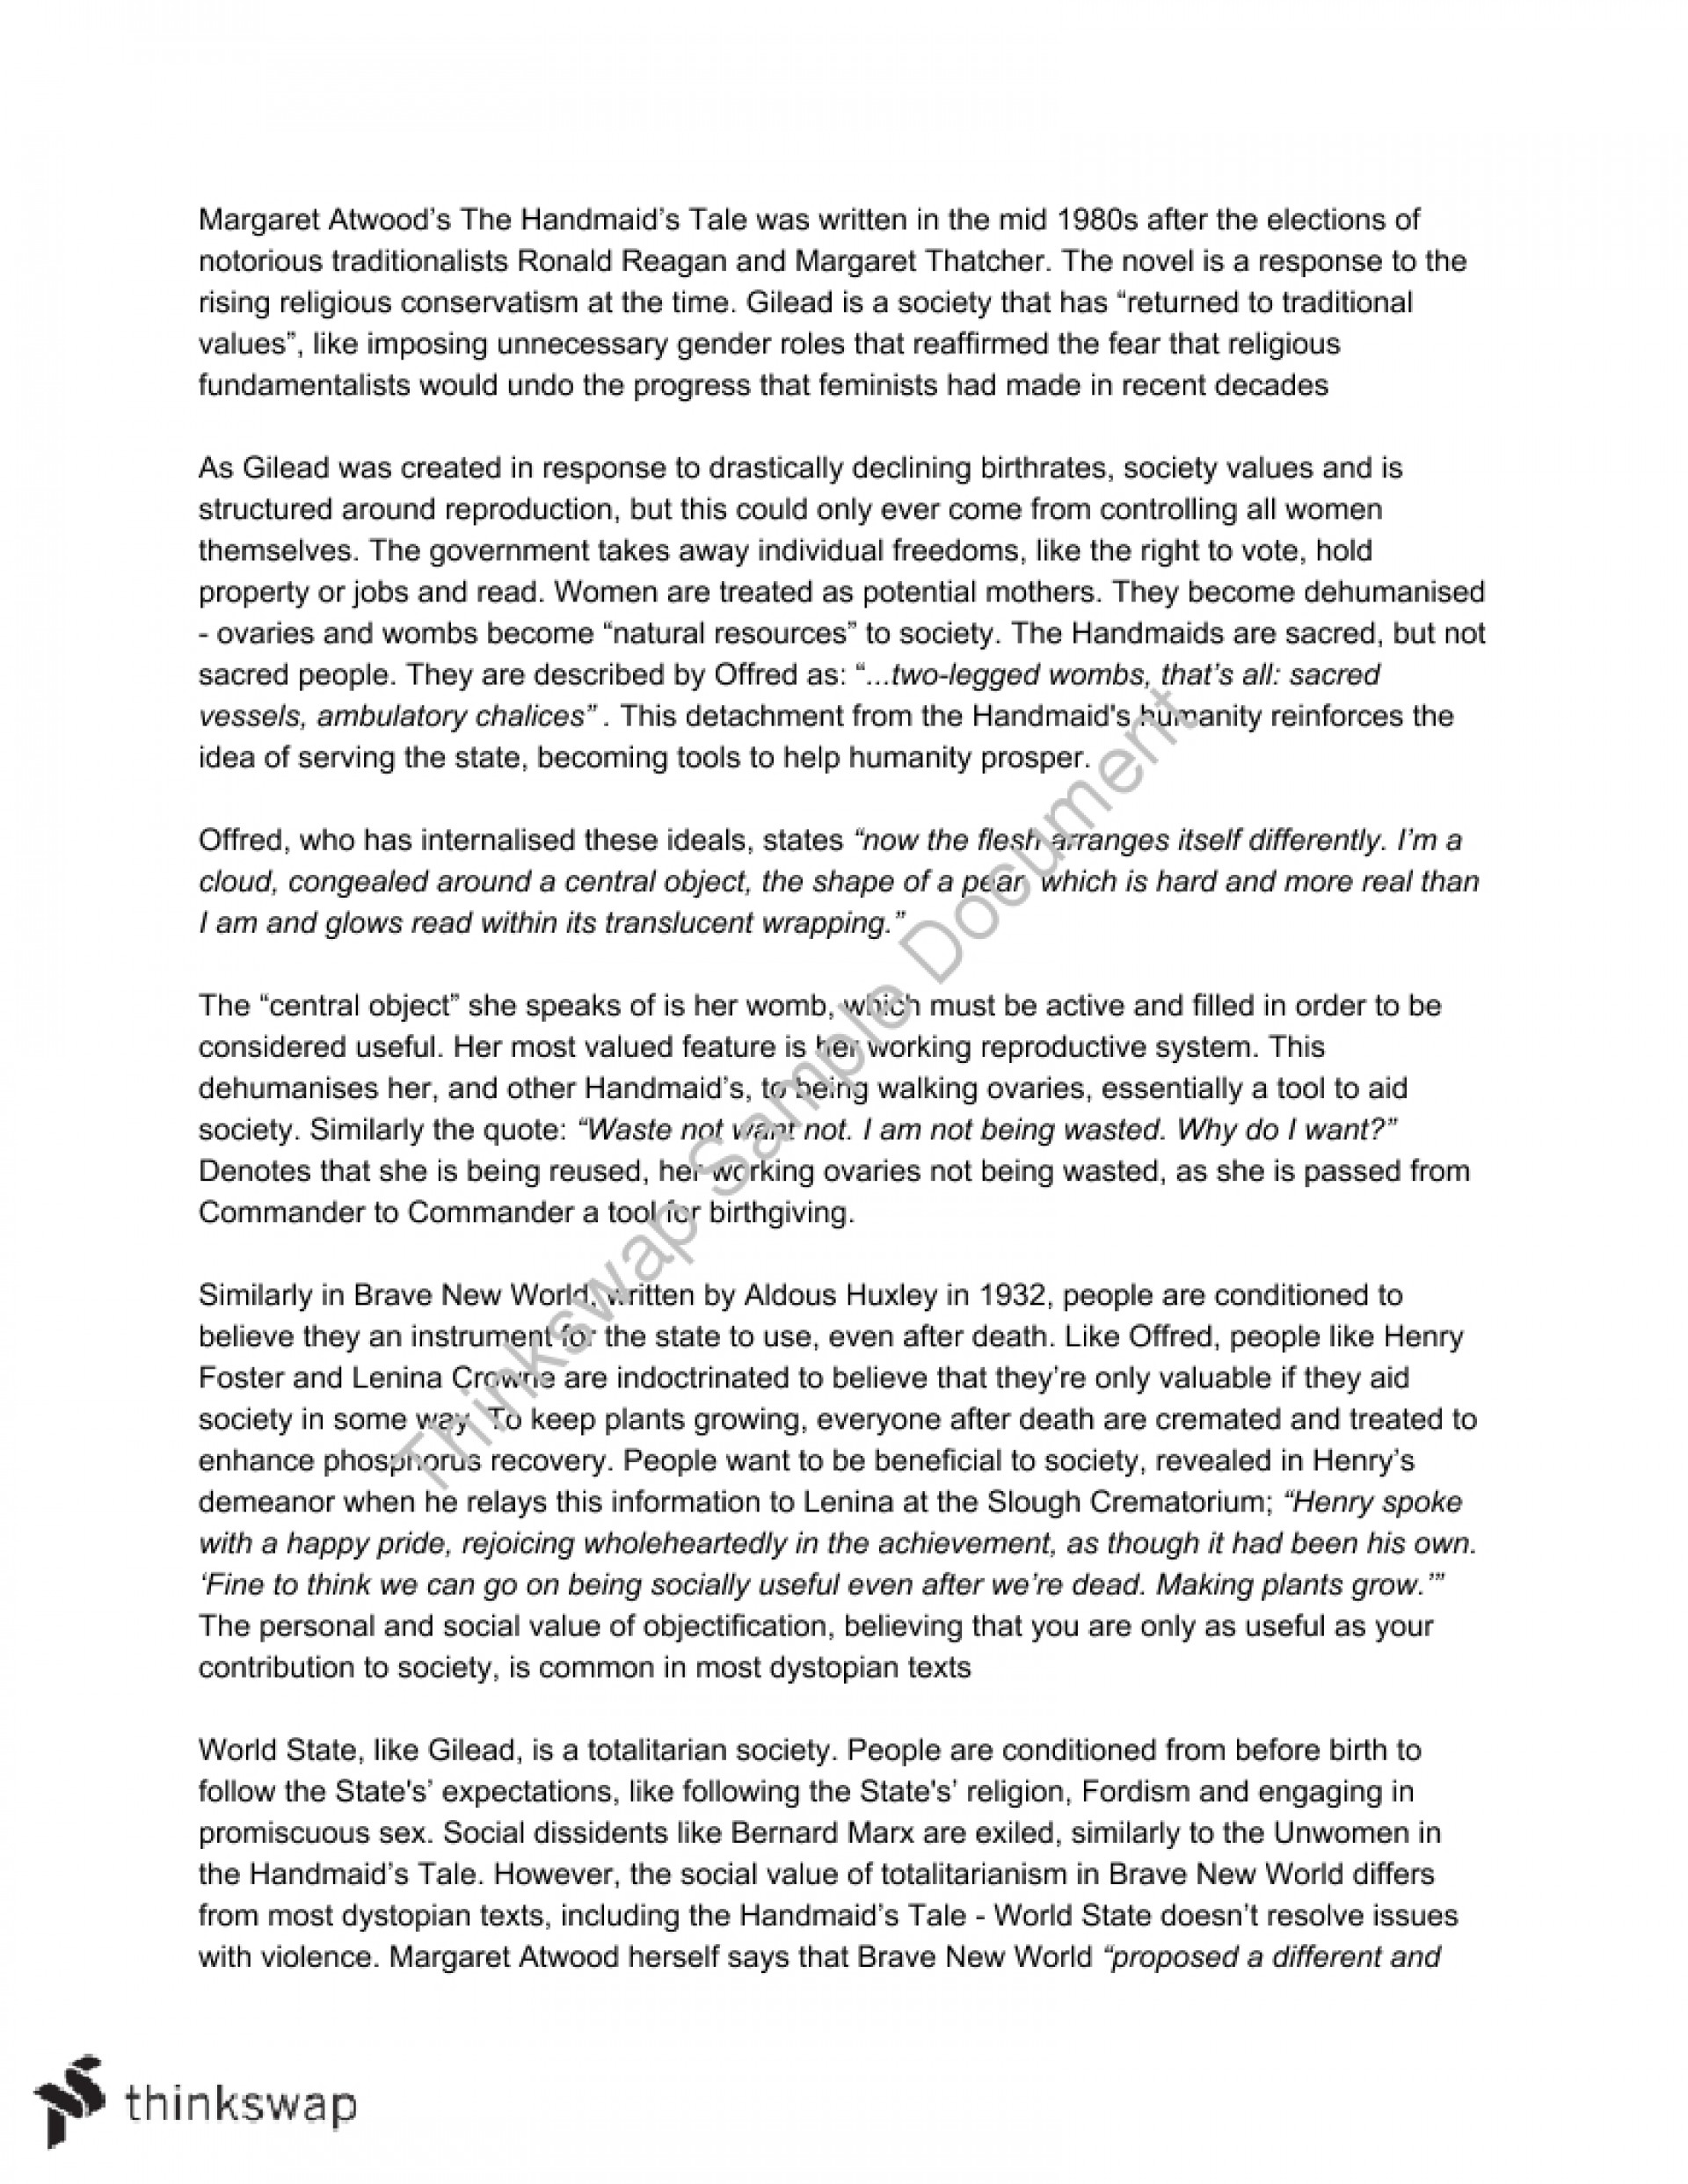 001 Essay Example 53179 Extensionassignment21 The Handmaids Astounding Tale Handmaid's Topics Paper 1920